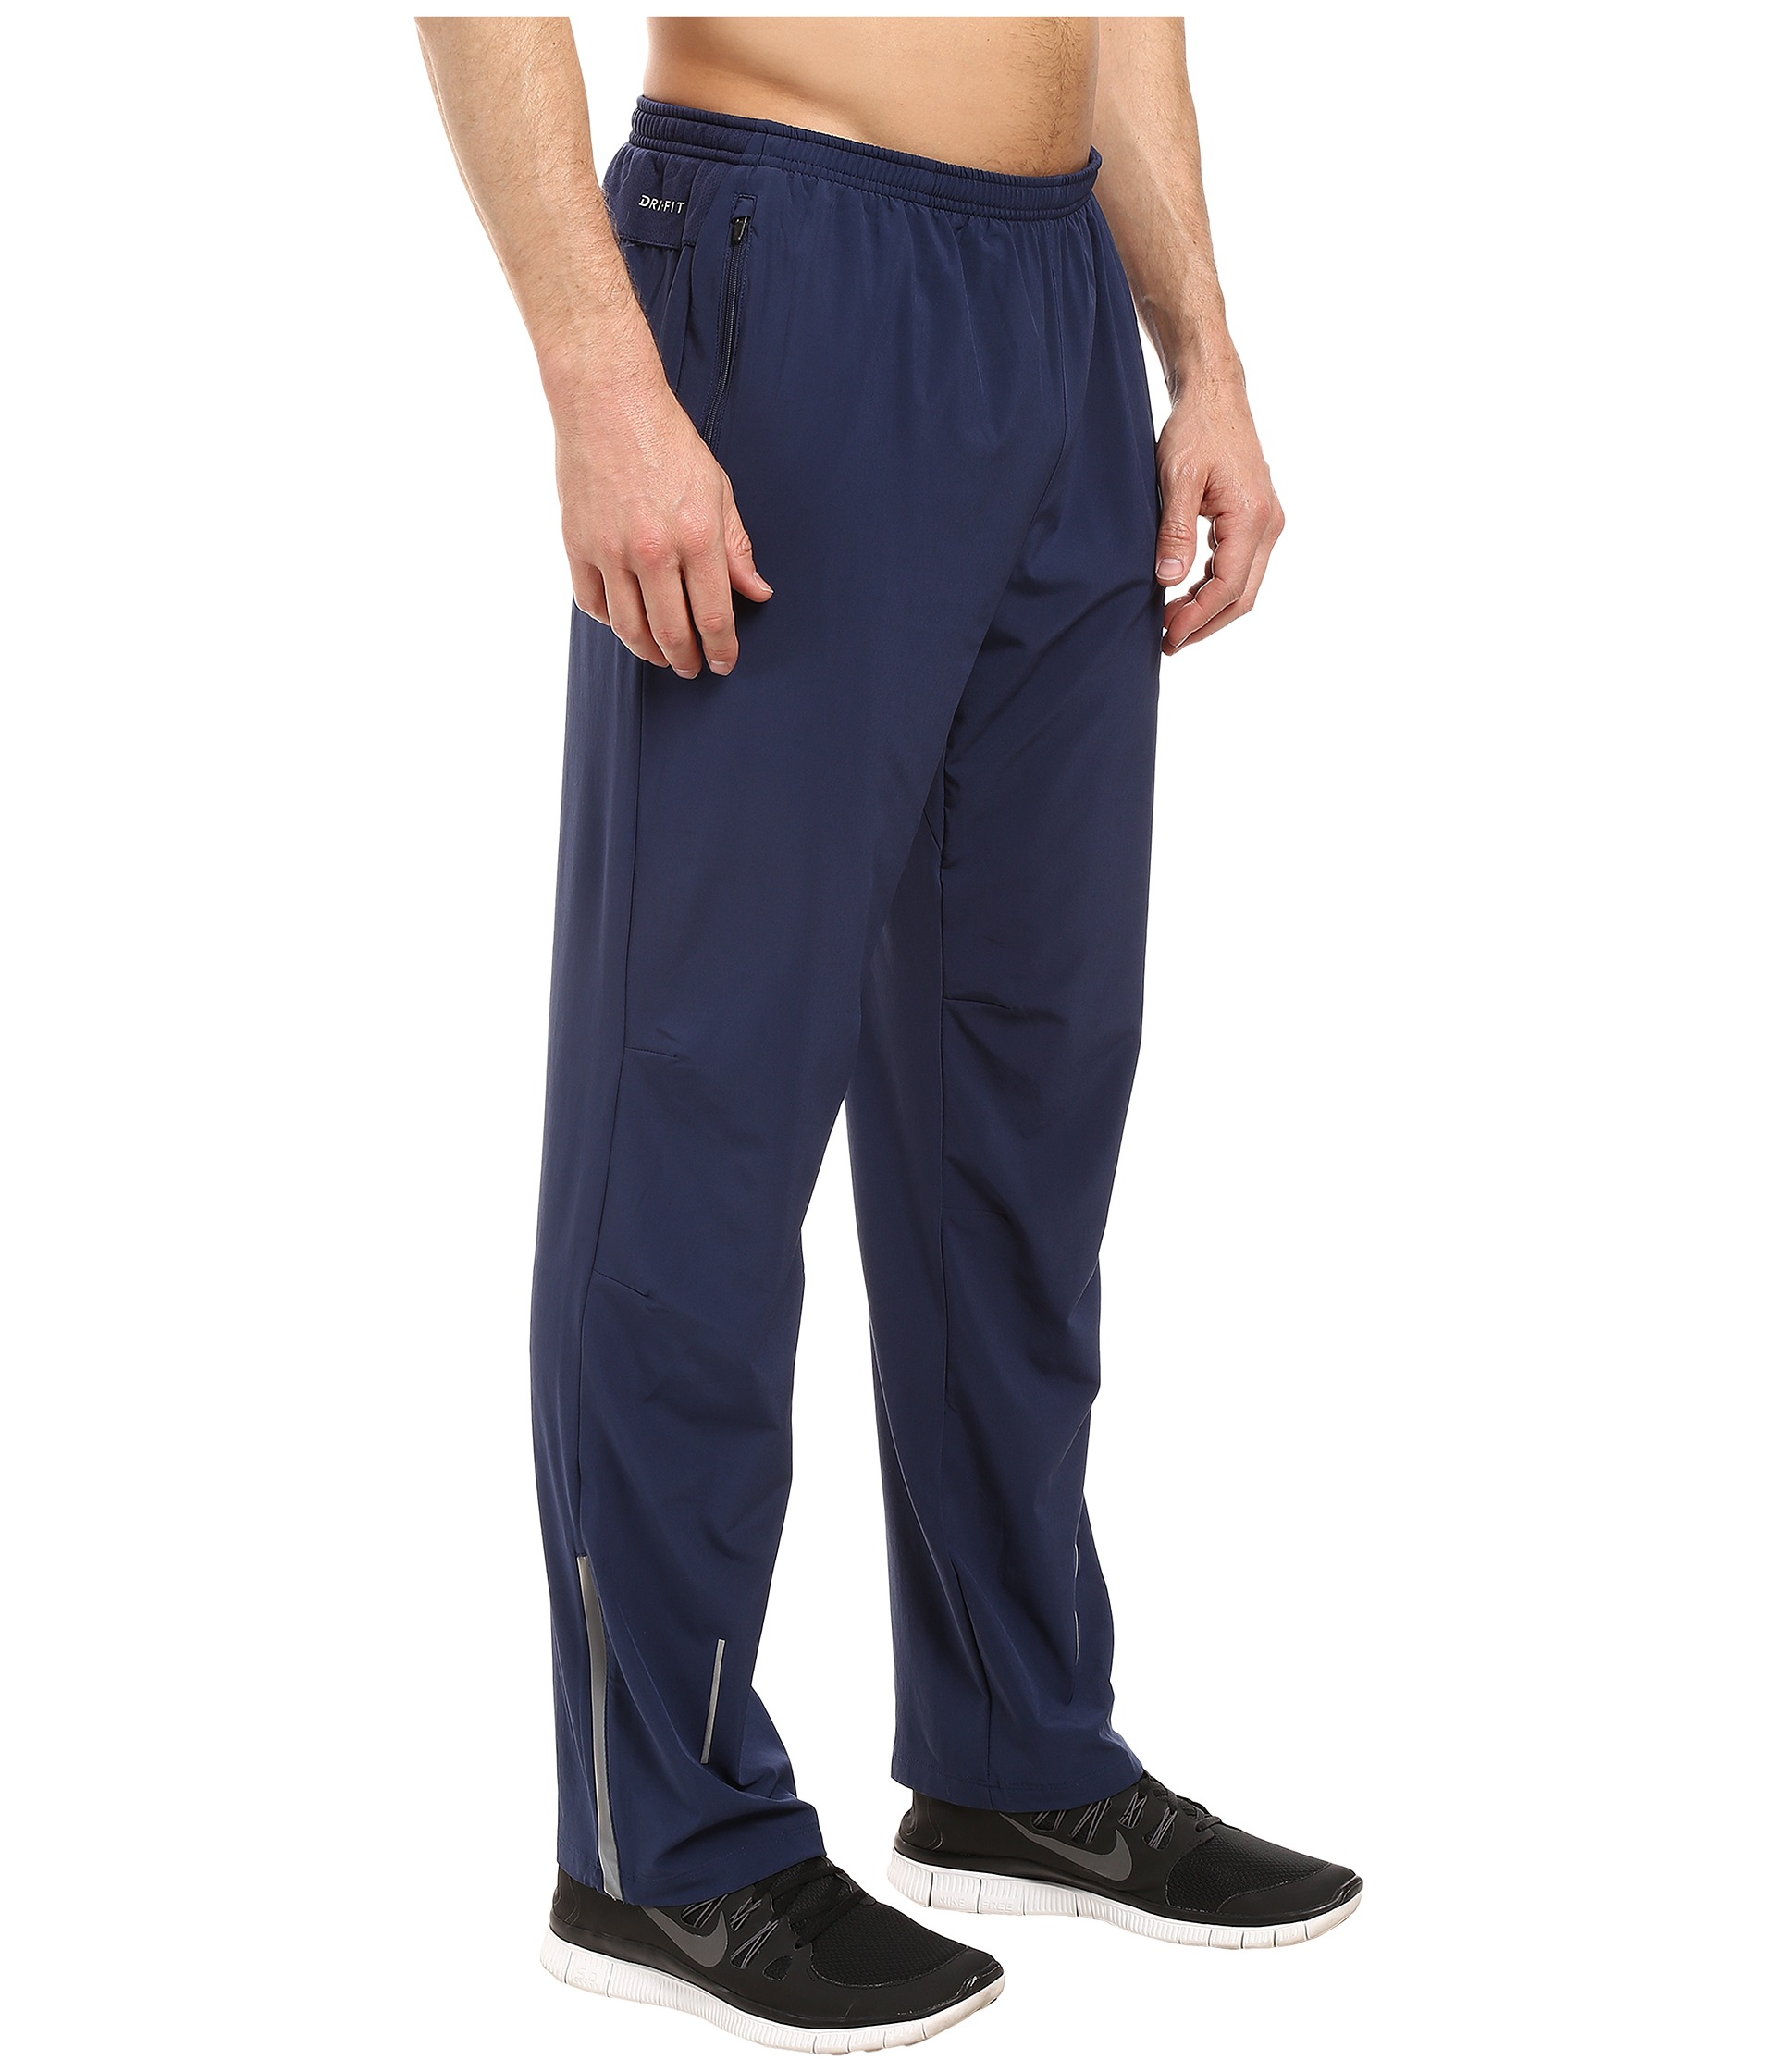 Nike Dri-FIT™ Stretch Woven Running Pant Midnight Navy ...